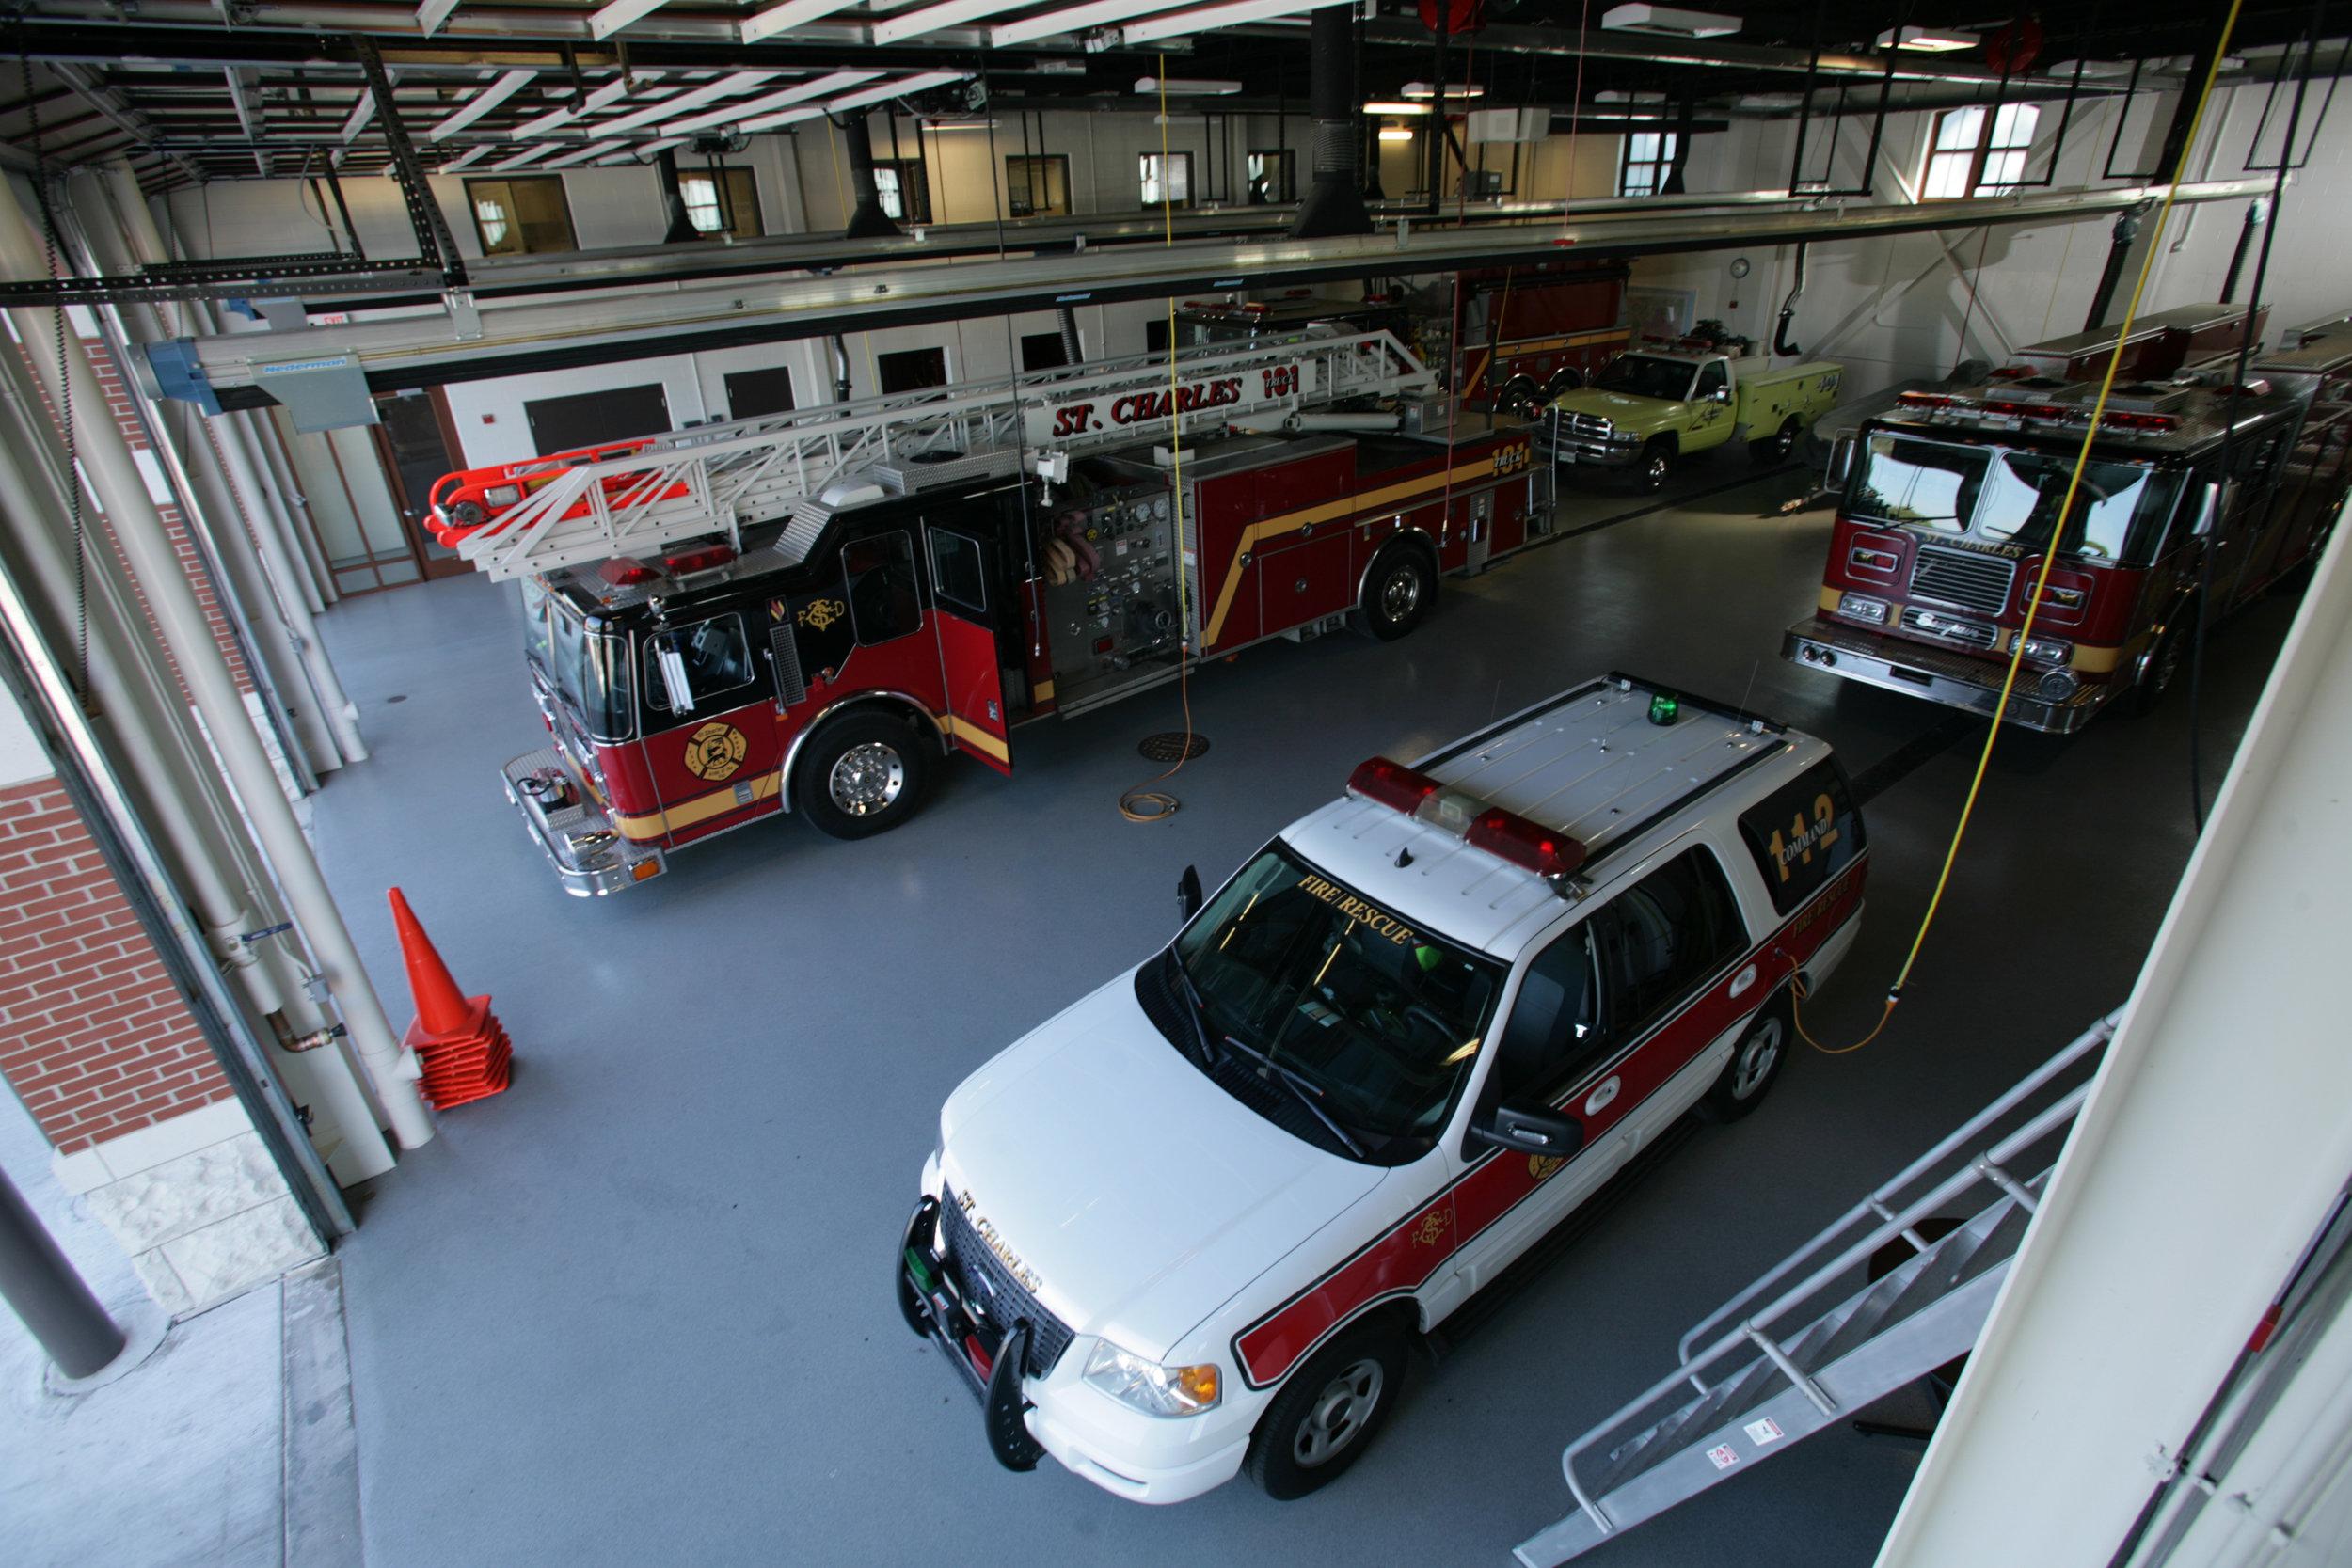 St. Charles Fire Station-5406.jpg